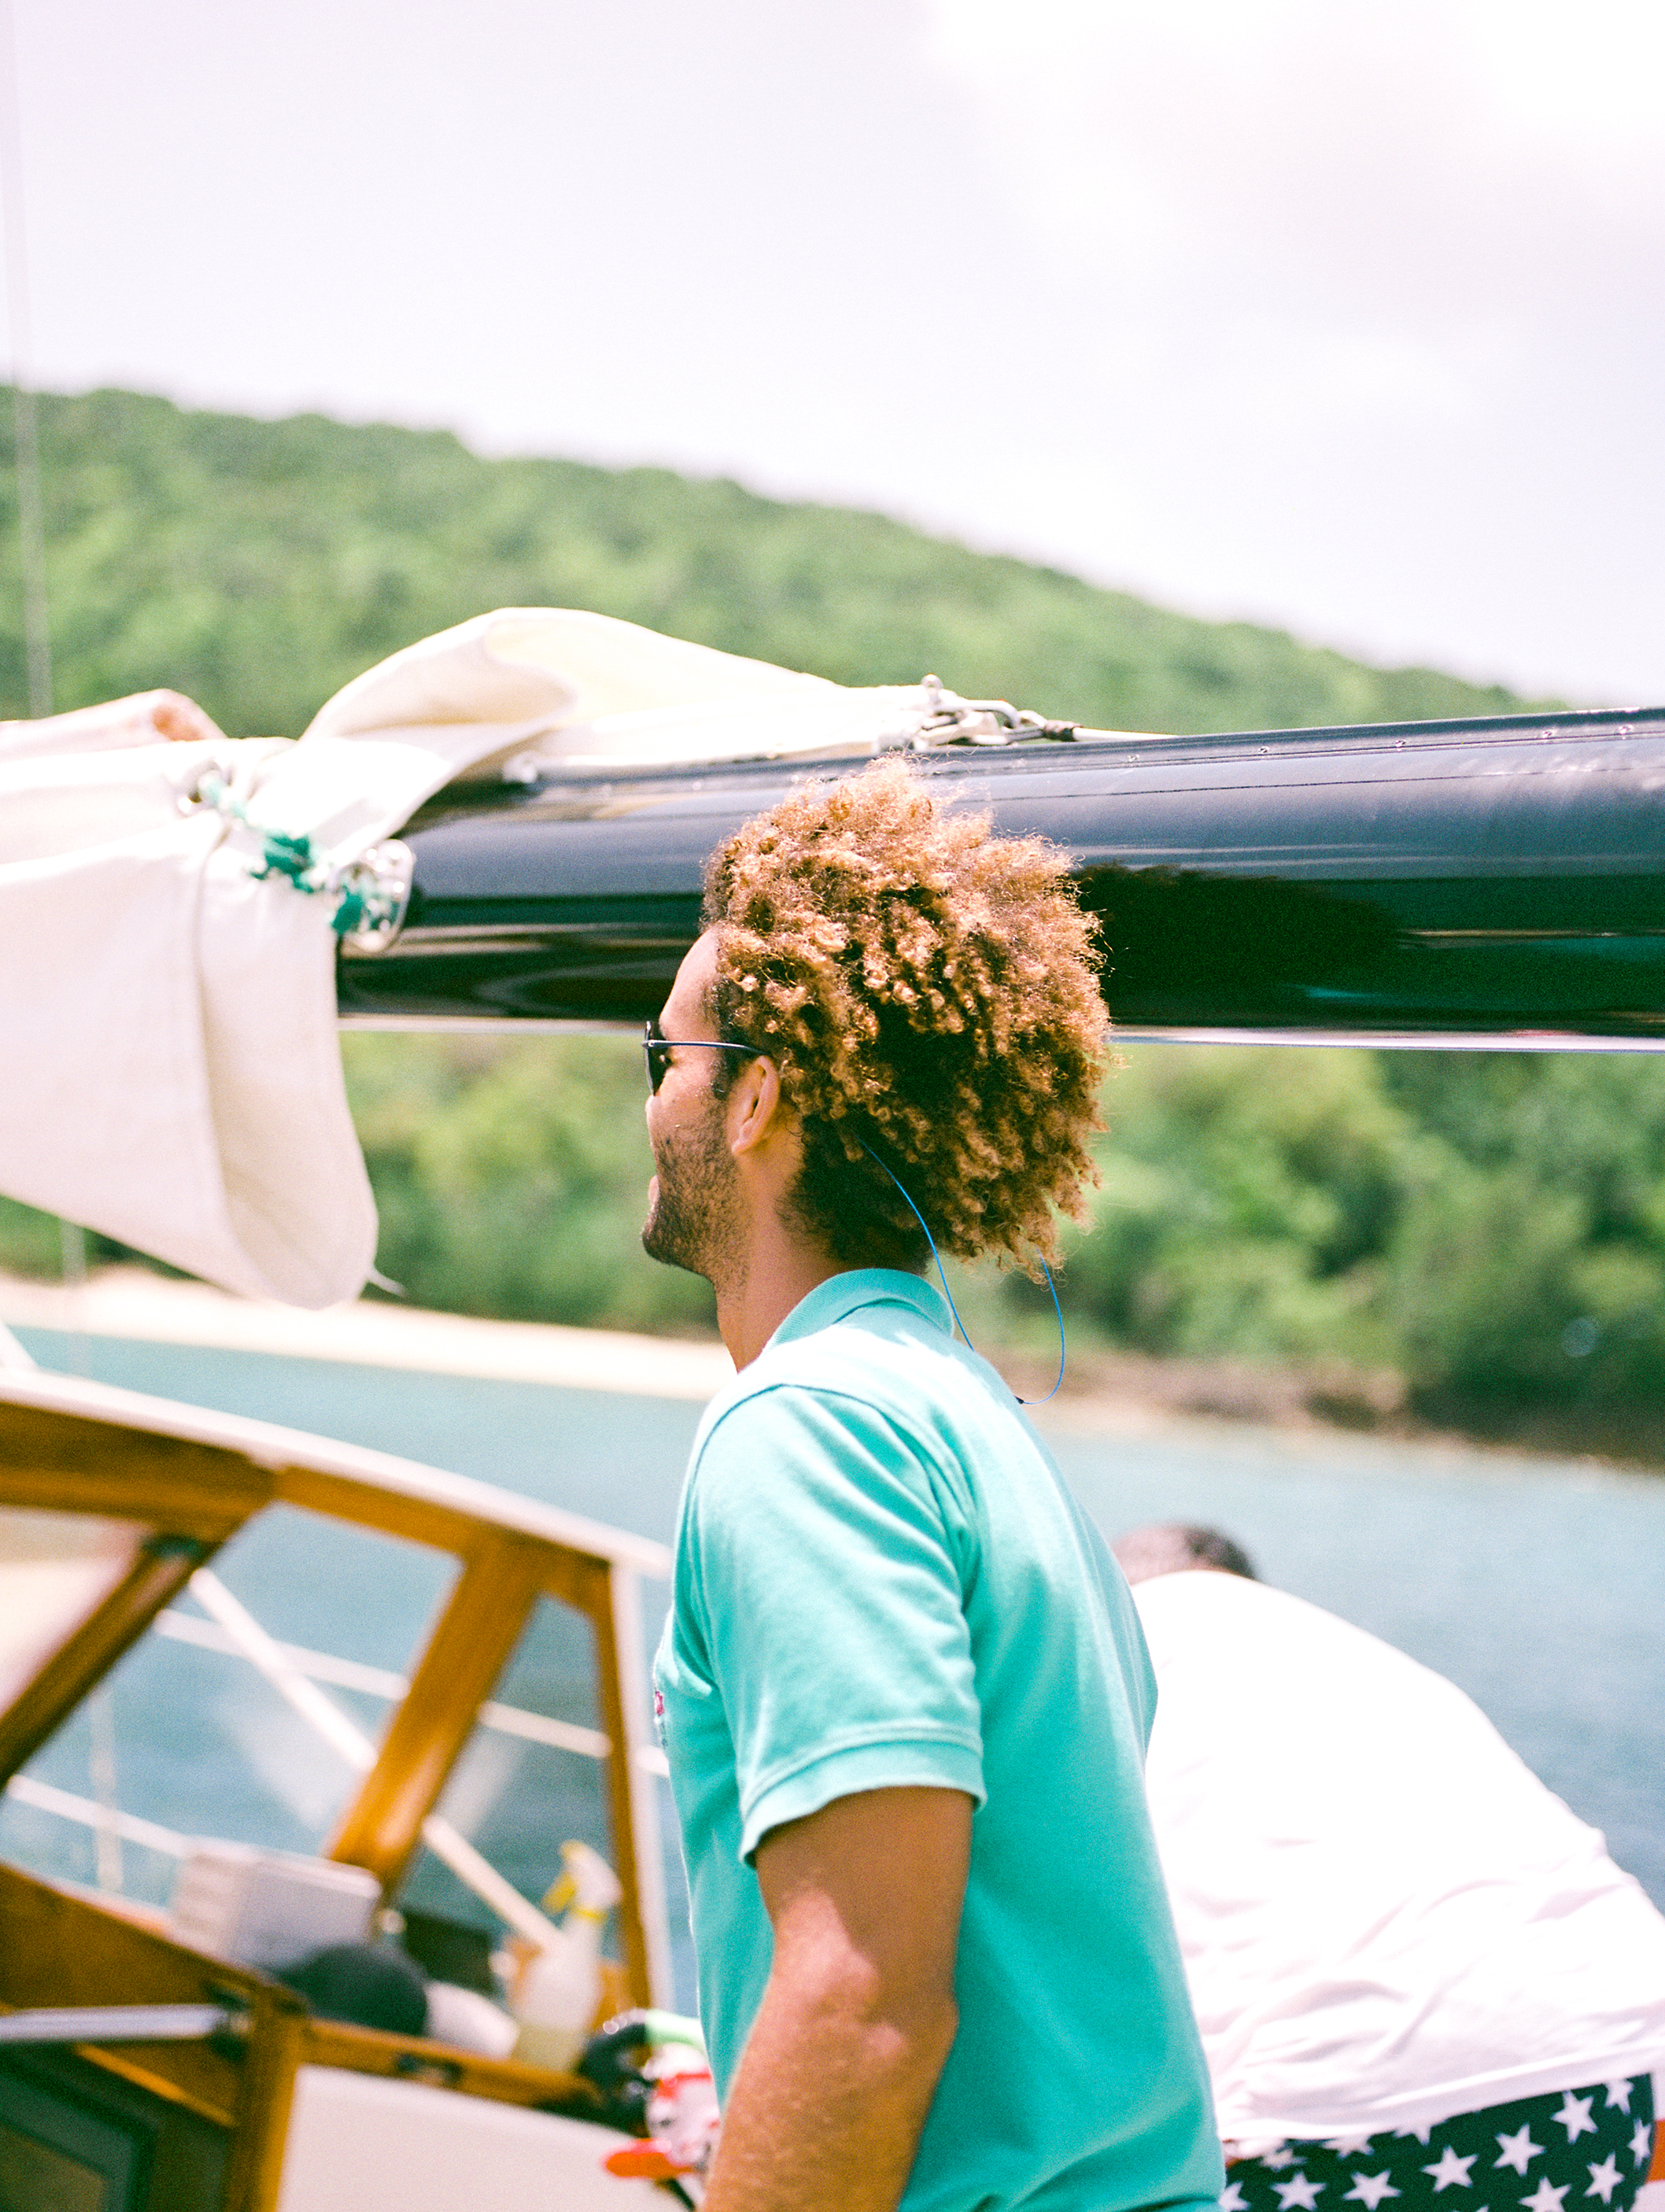 st thomas st john usvi virgin islands photographer